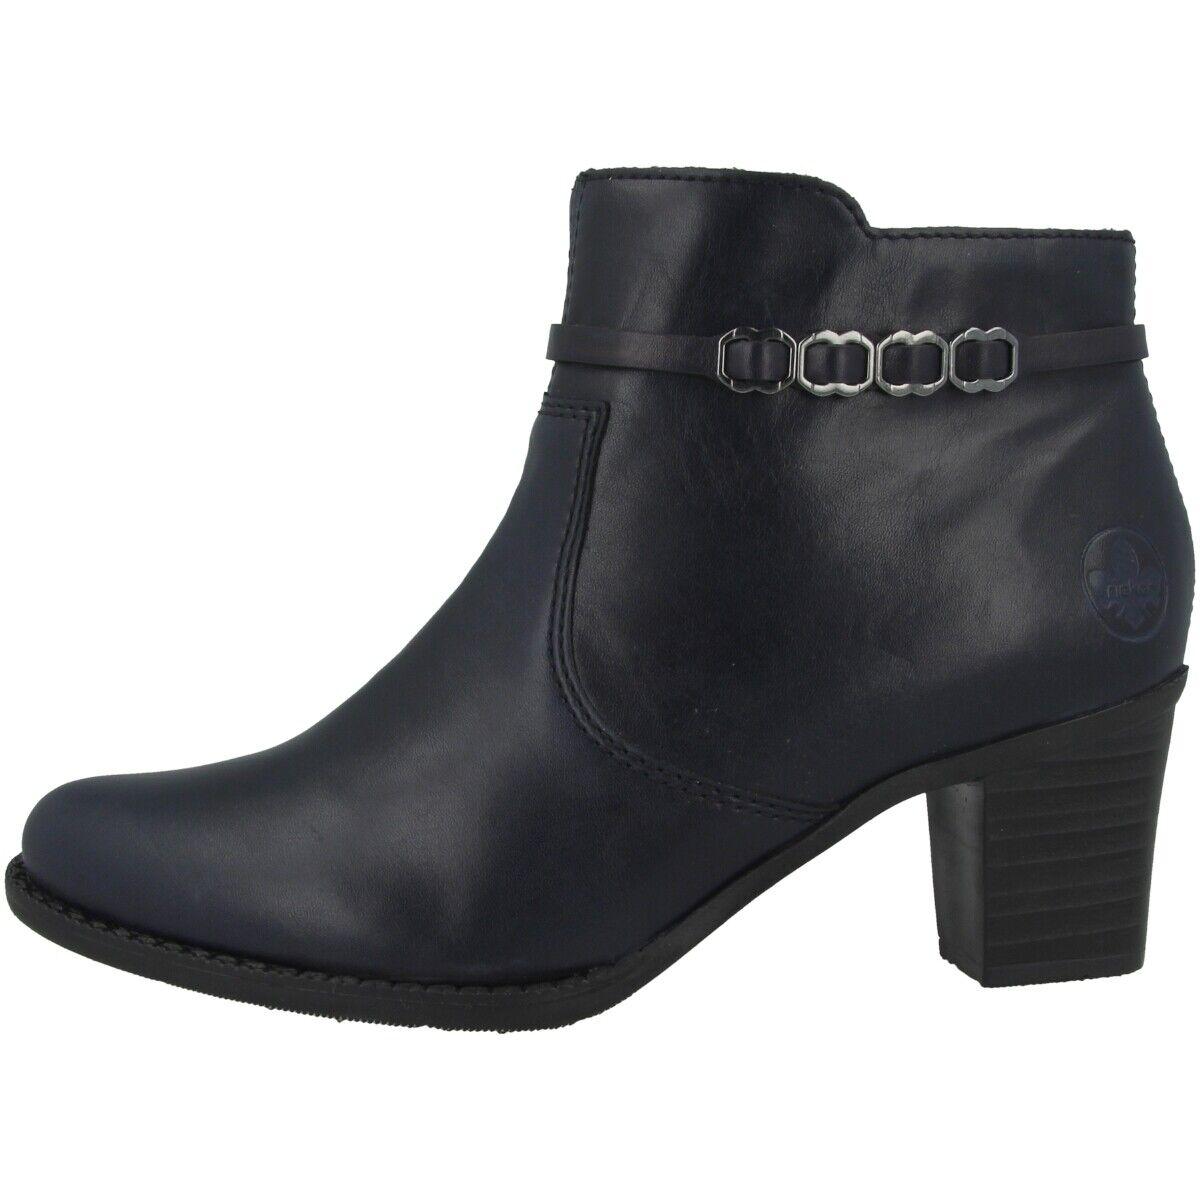 Rieker Vicente Schuhe Antistress Damen Stiefeletten Ankle Stiefel Stiefel L7678-14